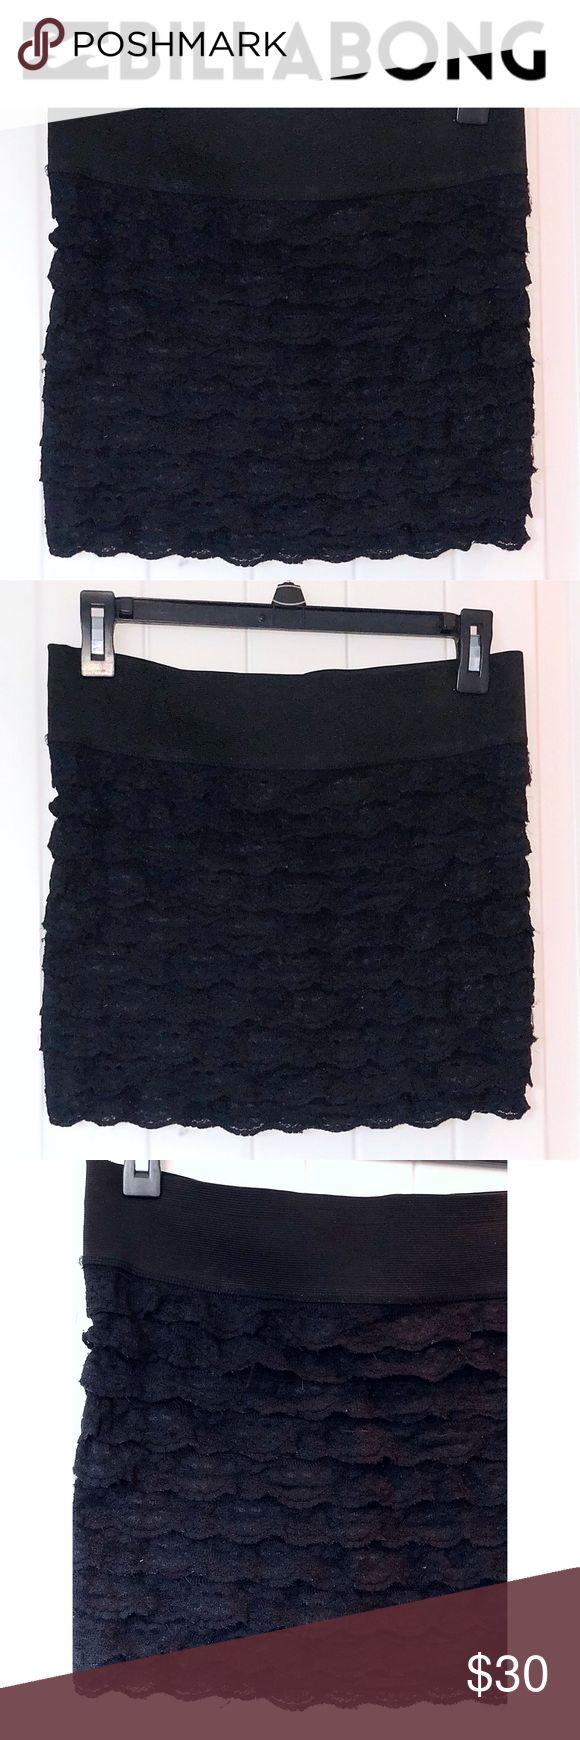 Ruffle Lace Mini Skirt Billabong Designer's Closet: Ruffle Lace Mini Skirt  (Black)   •Good Condition  -Gently Used   •Original Price: $49.00 Billabong Skirts Mini